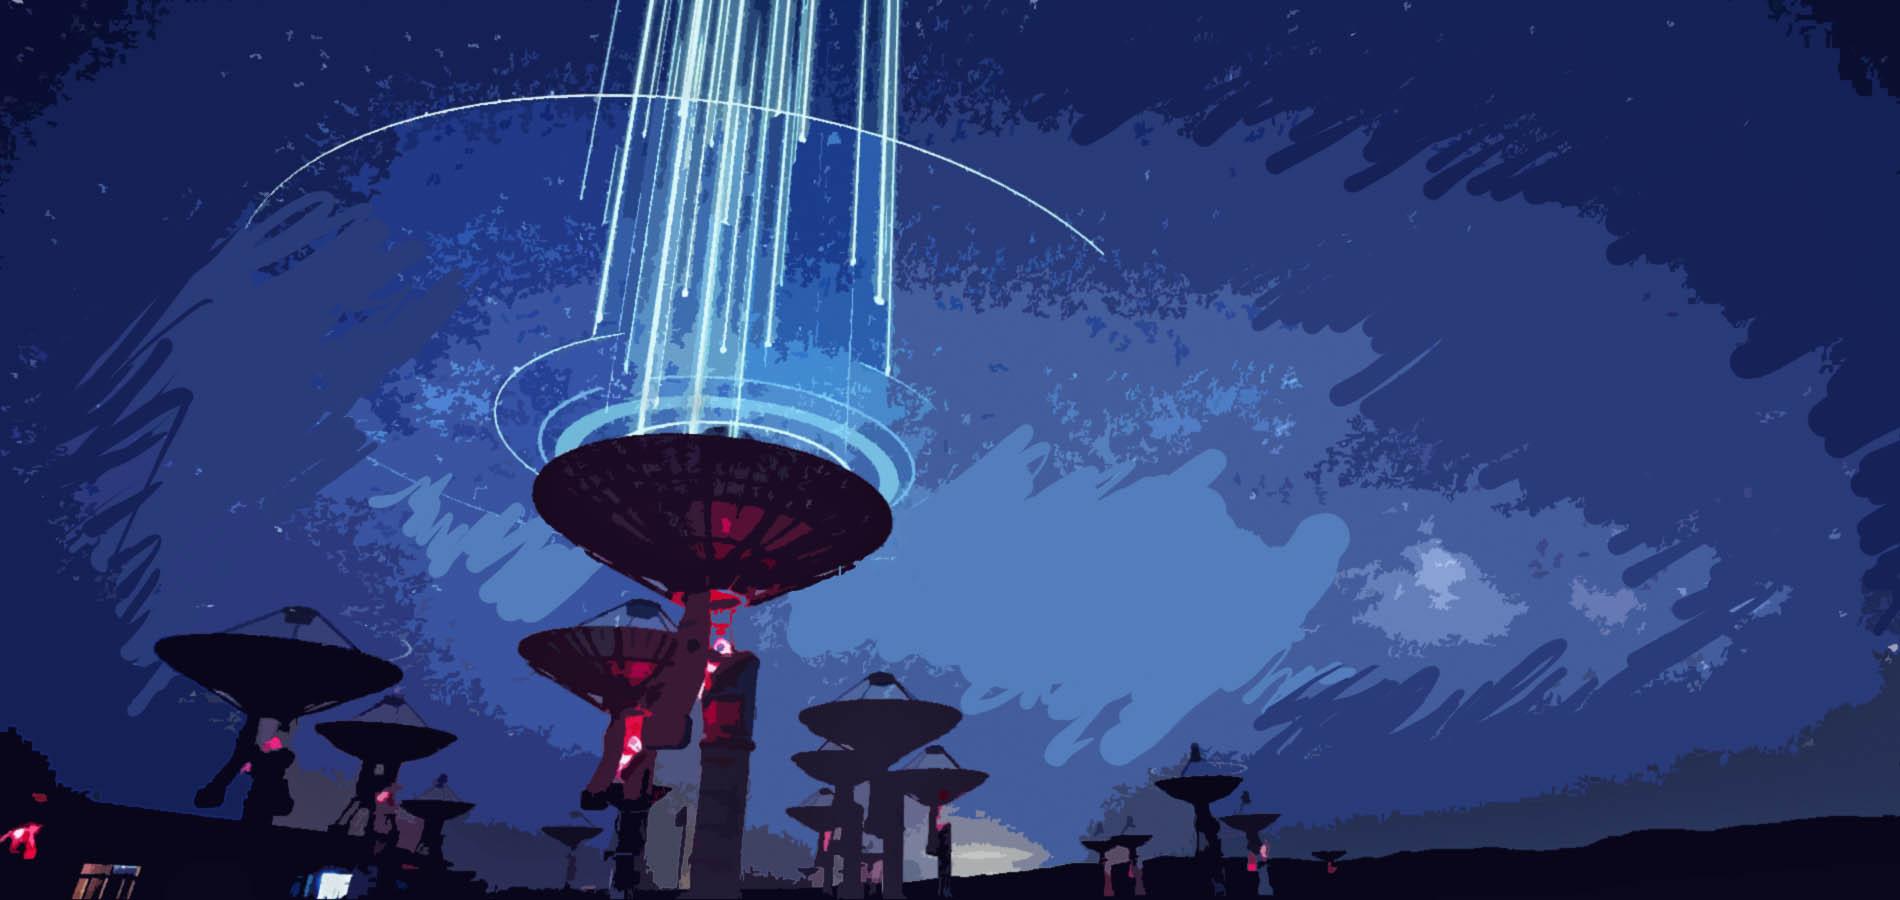 frb radioastronomia